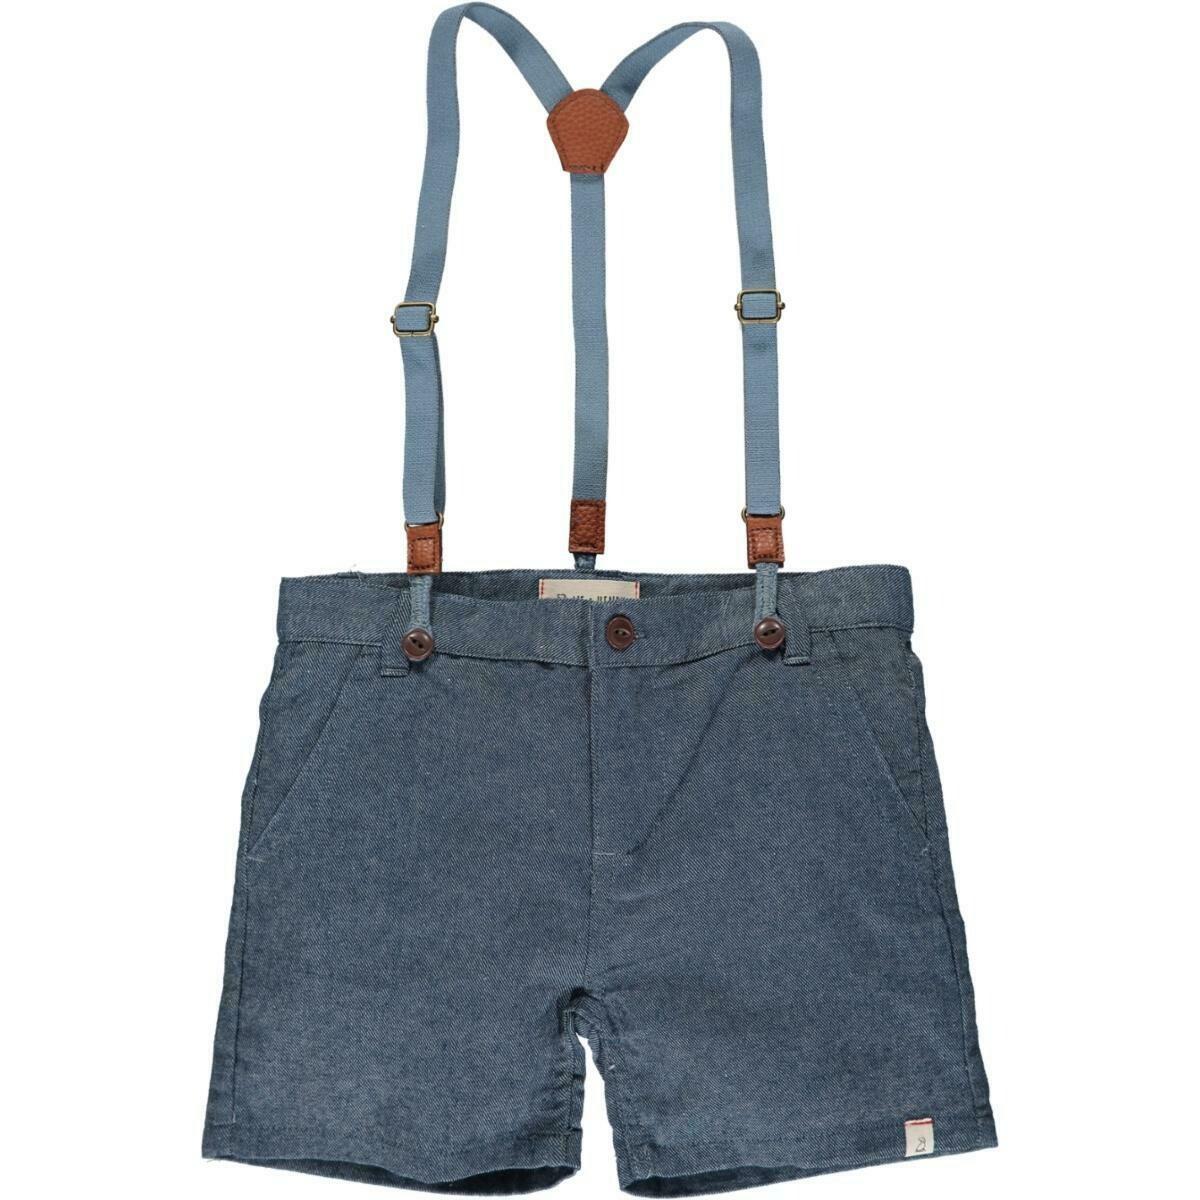 Me & Henry Suspender Shorts